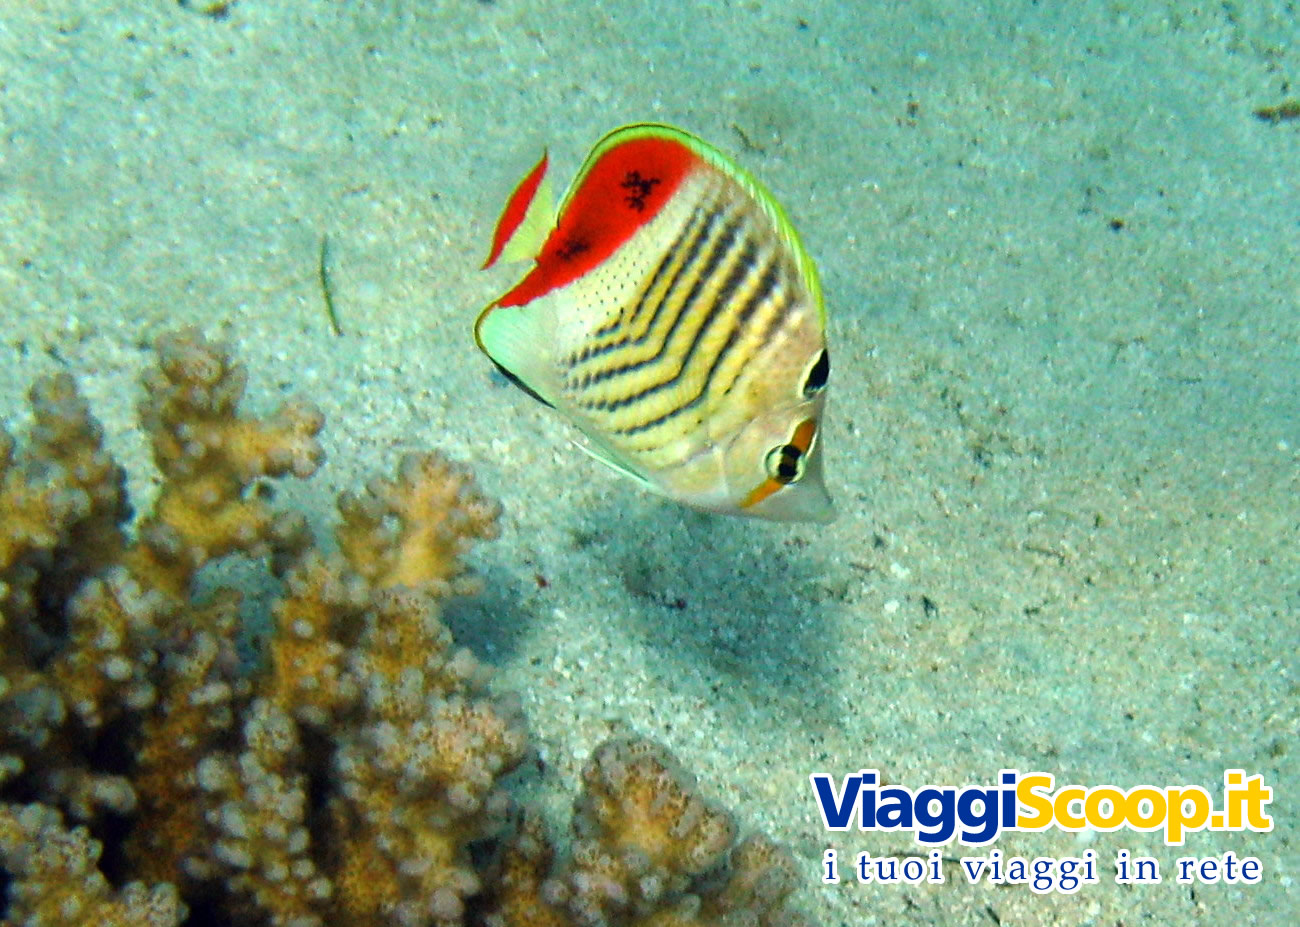 Sfondi desktop tropicali fondali marini pesci for Pesce rosso butterfly